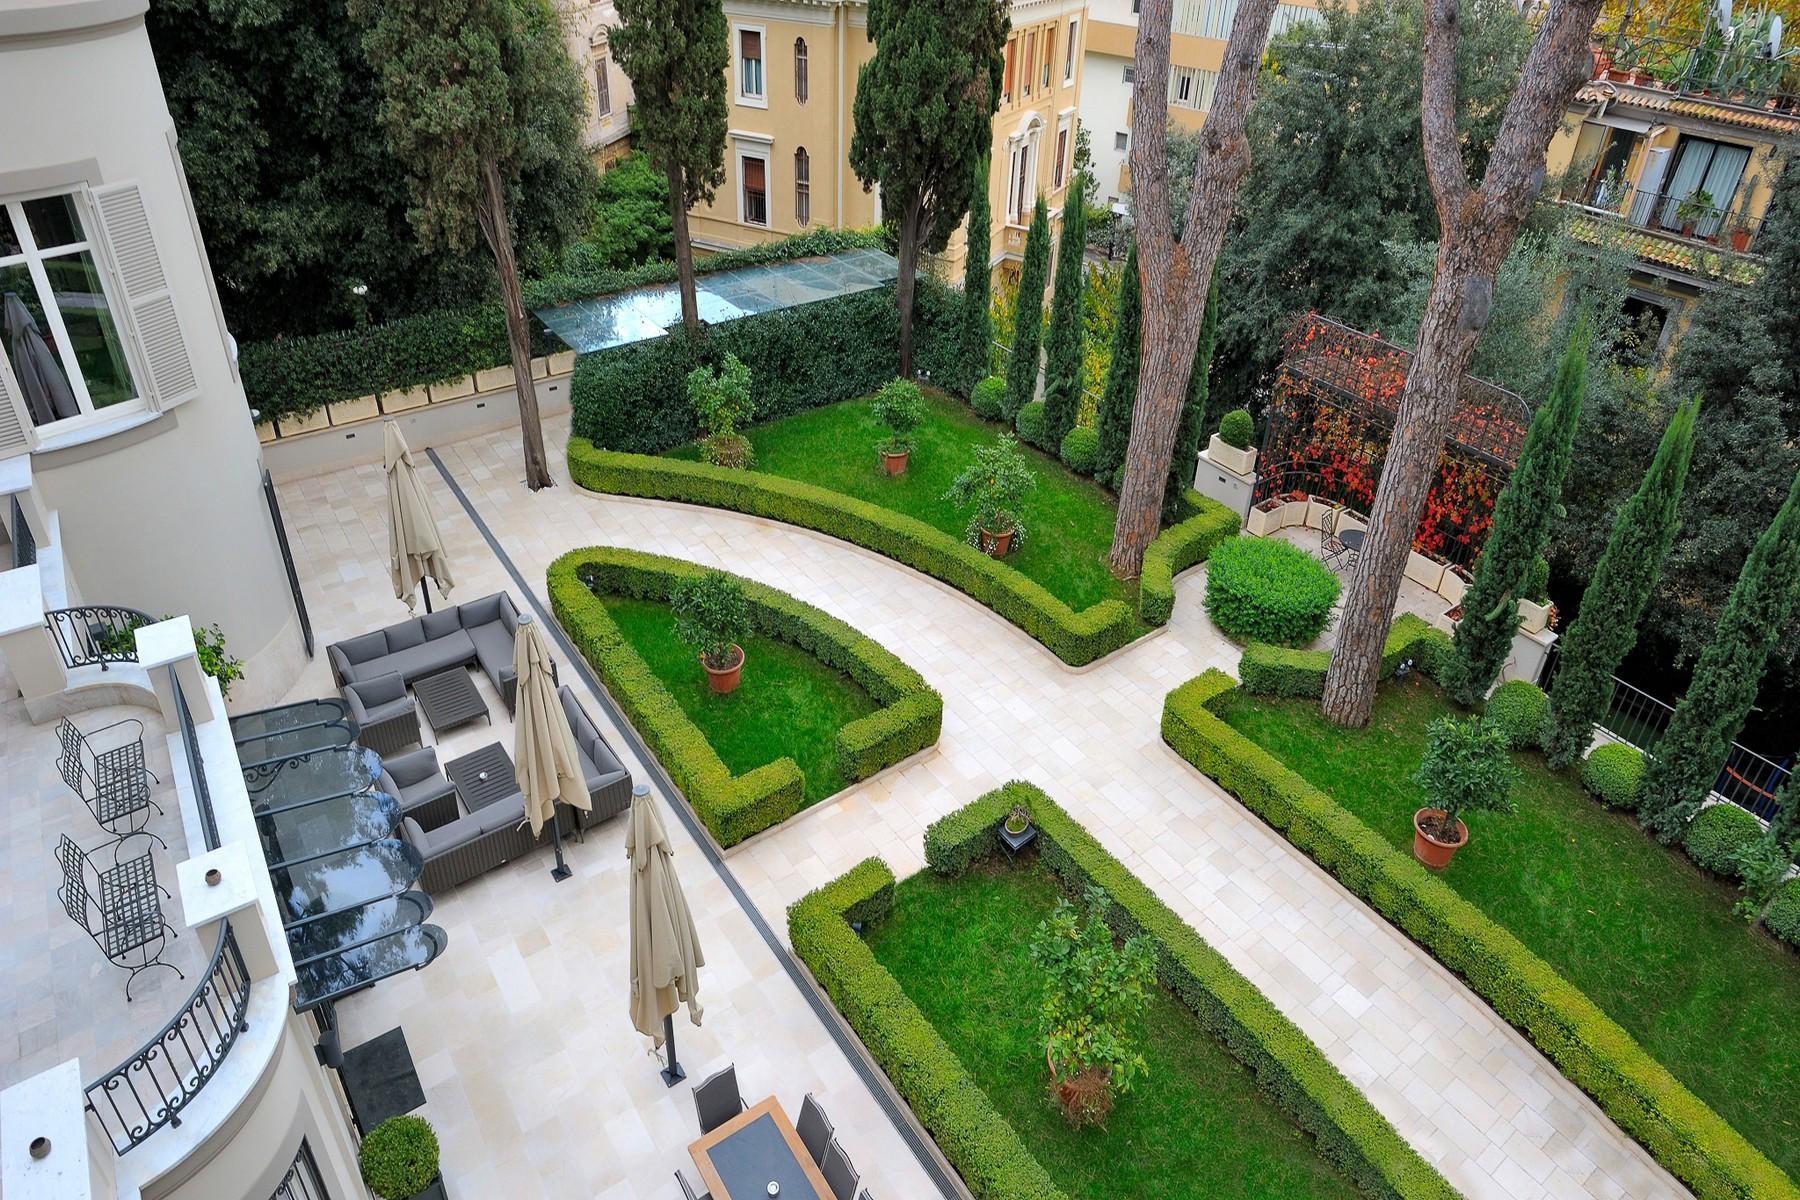 Villa Calandrelli, Charme und Stil im grünen Herzen Roms - 3